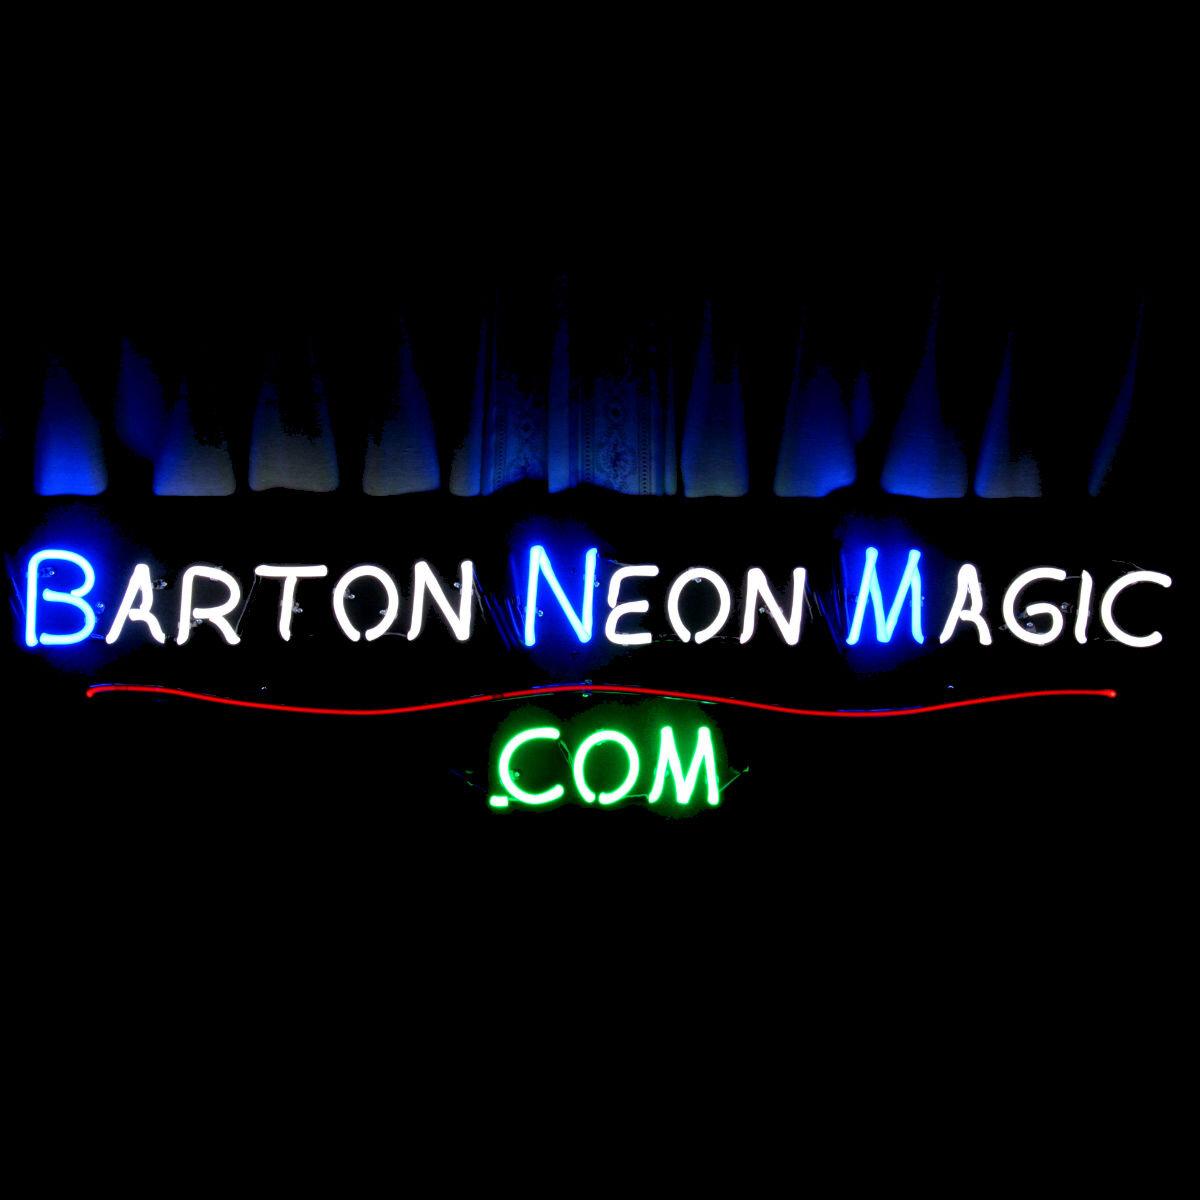 SCOTTIE DOG NEON LIGHT SCULPTURE - BY JOHN BARTON - BartonNeonMagic.com